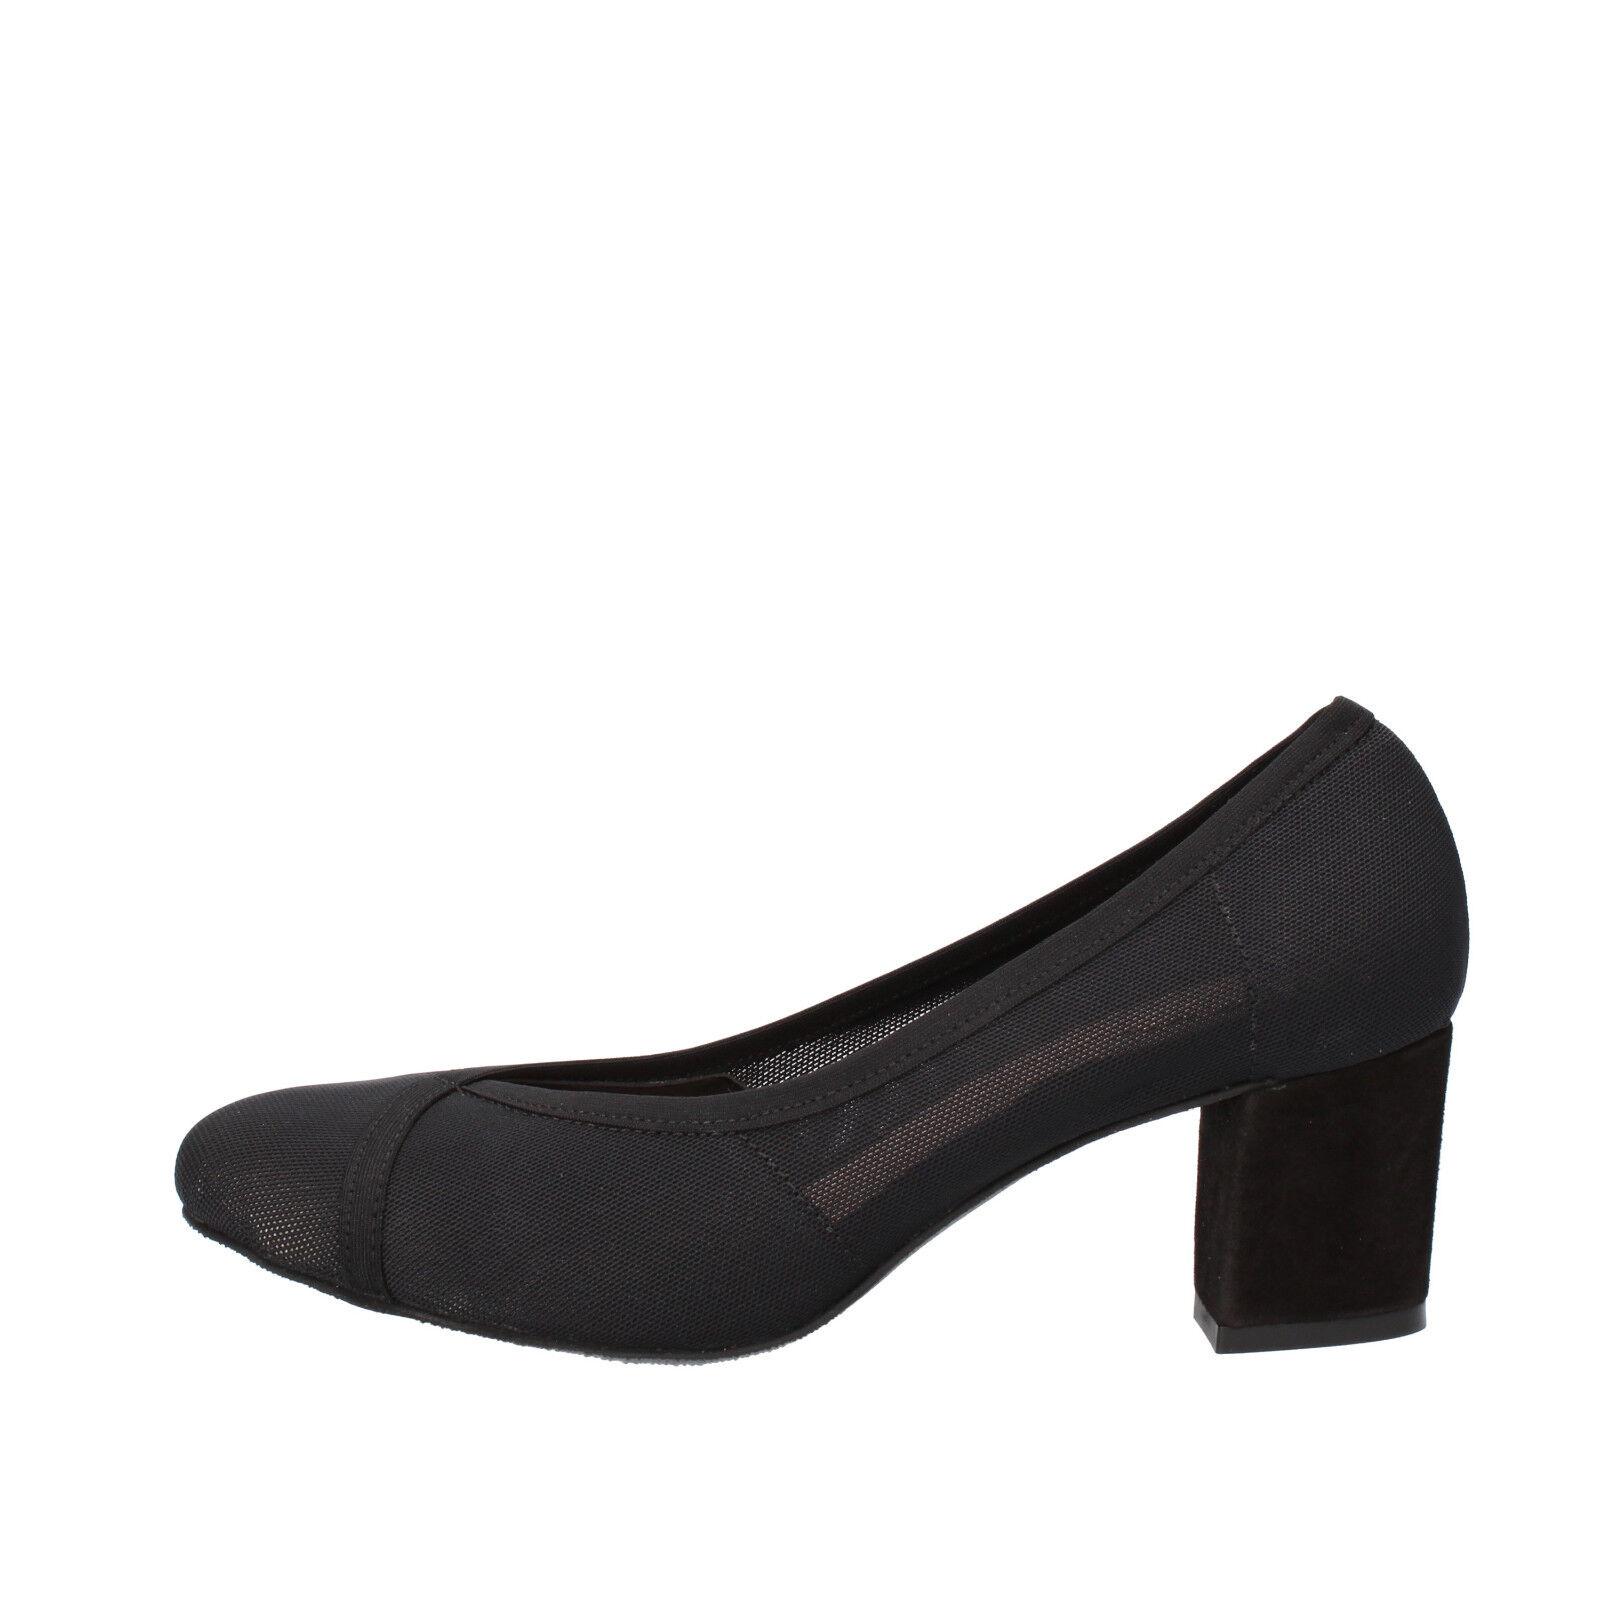 scarpe donna KEYS 36 decolte nero tessuto camoscio AG786-B